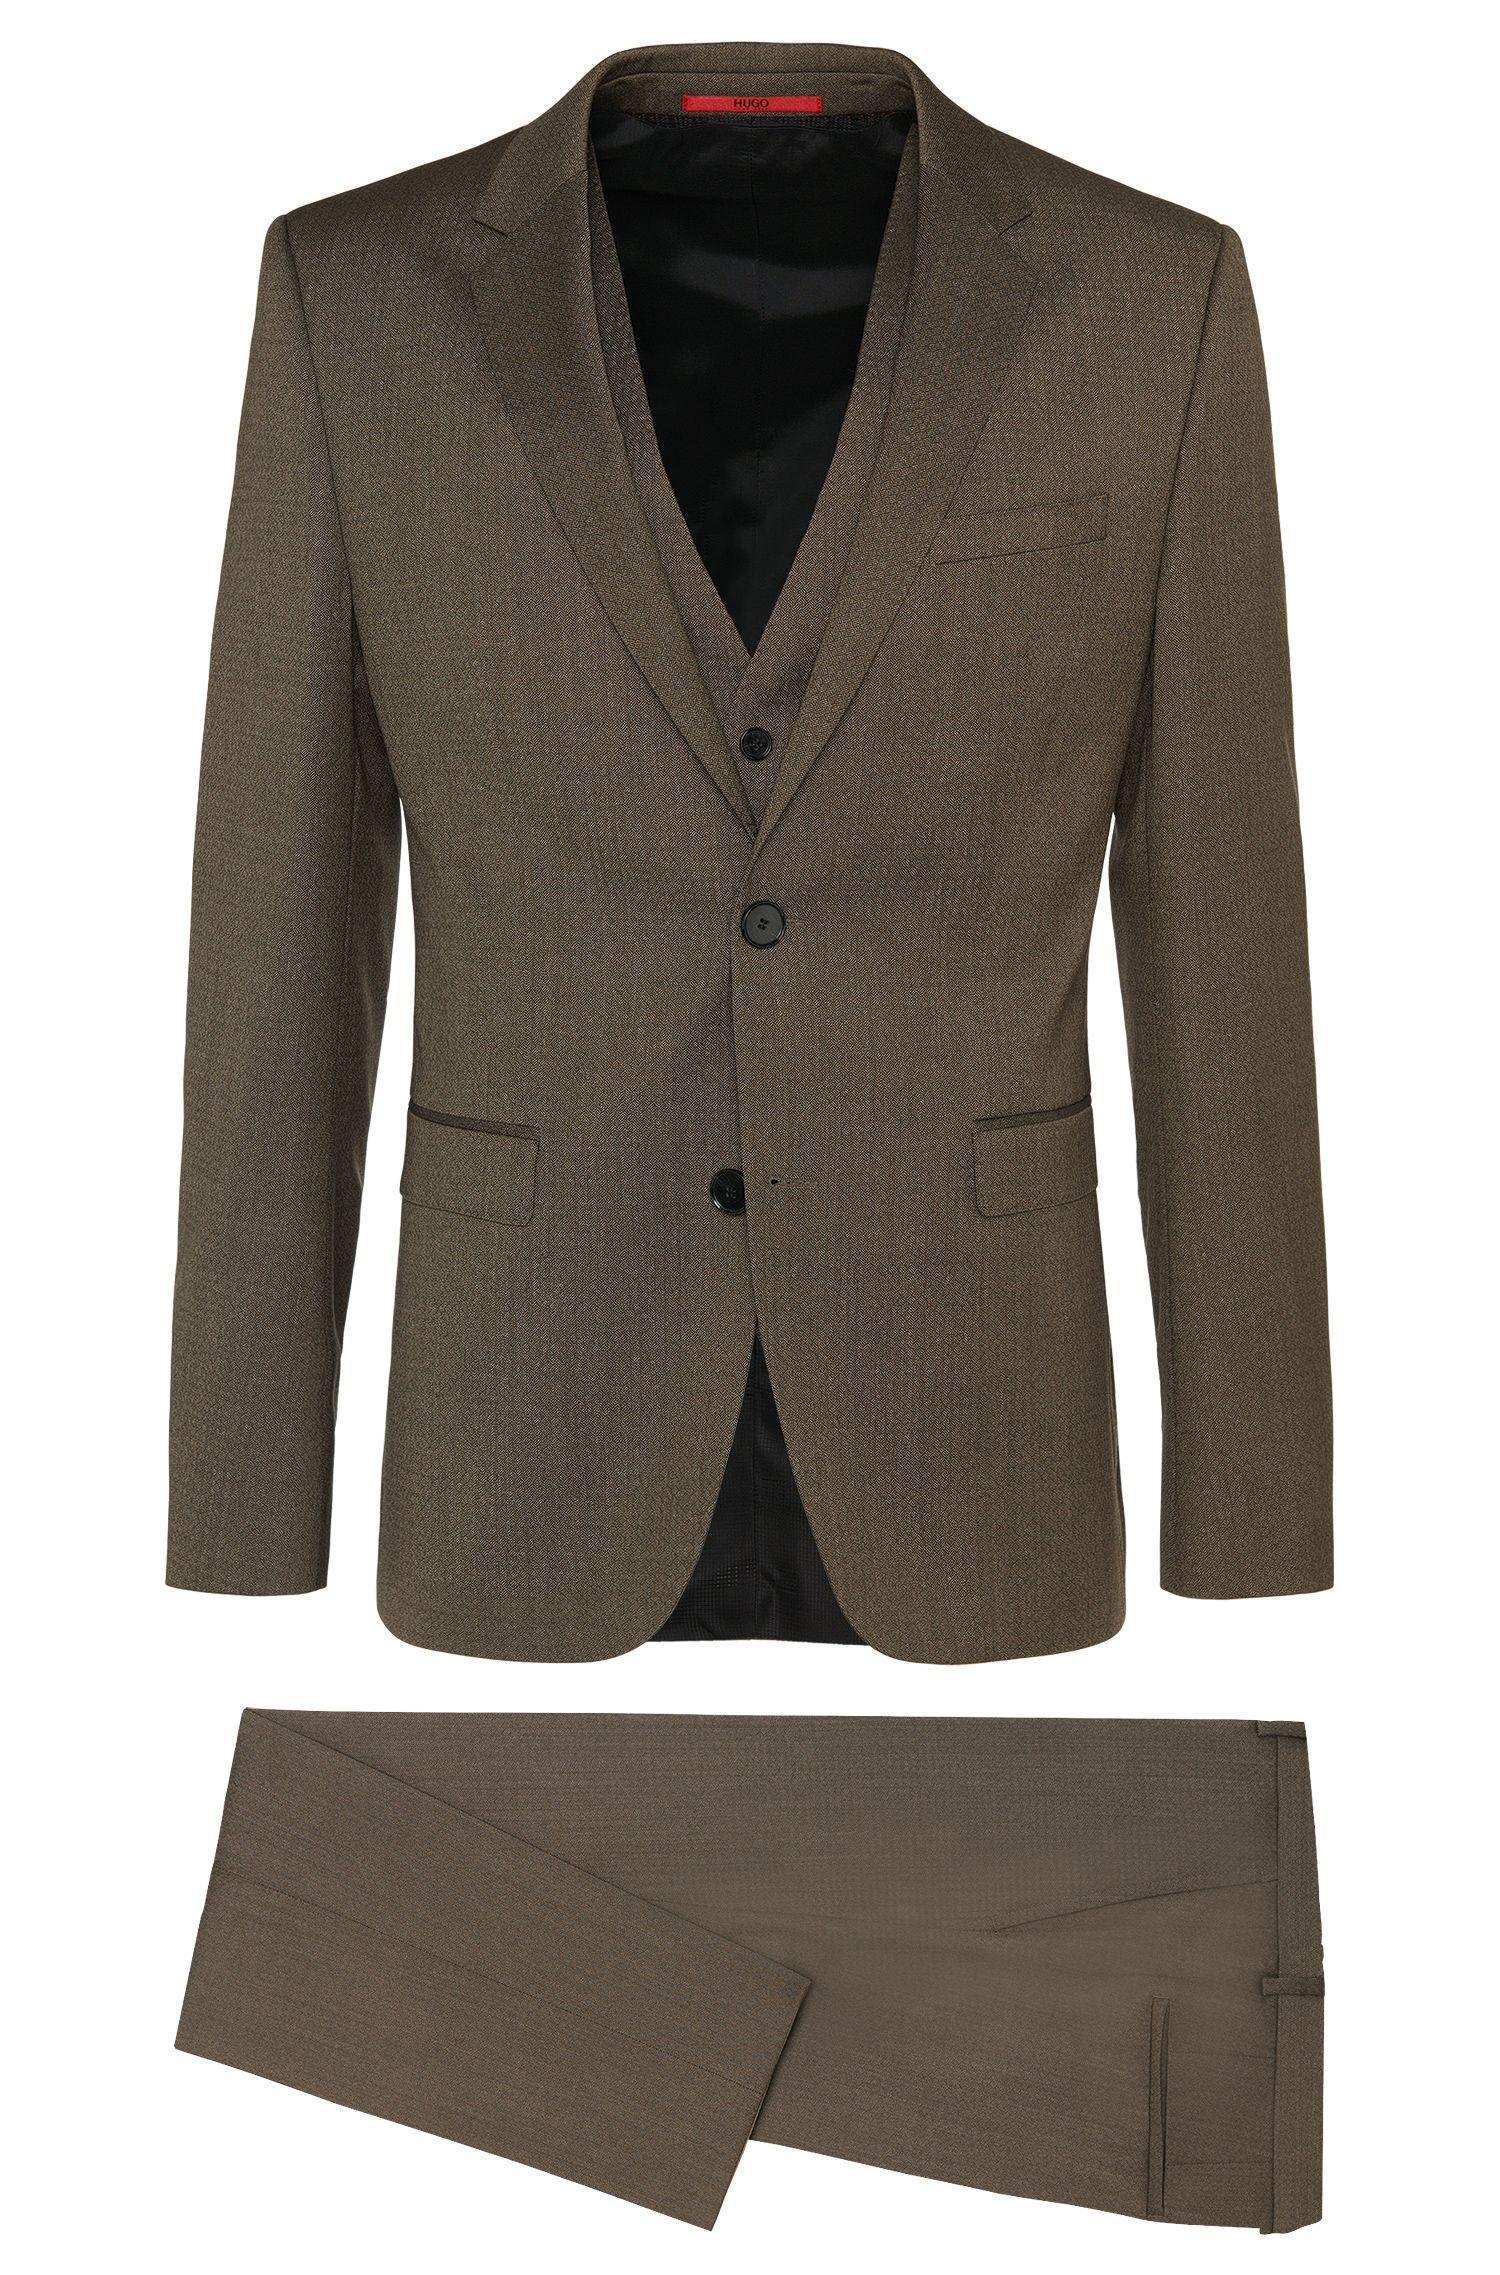 'Adwart/Wilard/Hets' | Slim Fit, Virgin Wool Patterned 3-Piece Suit